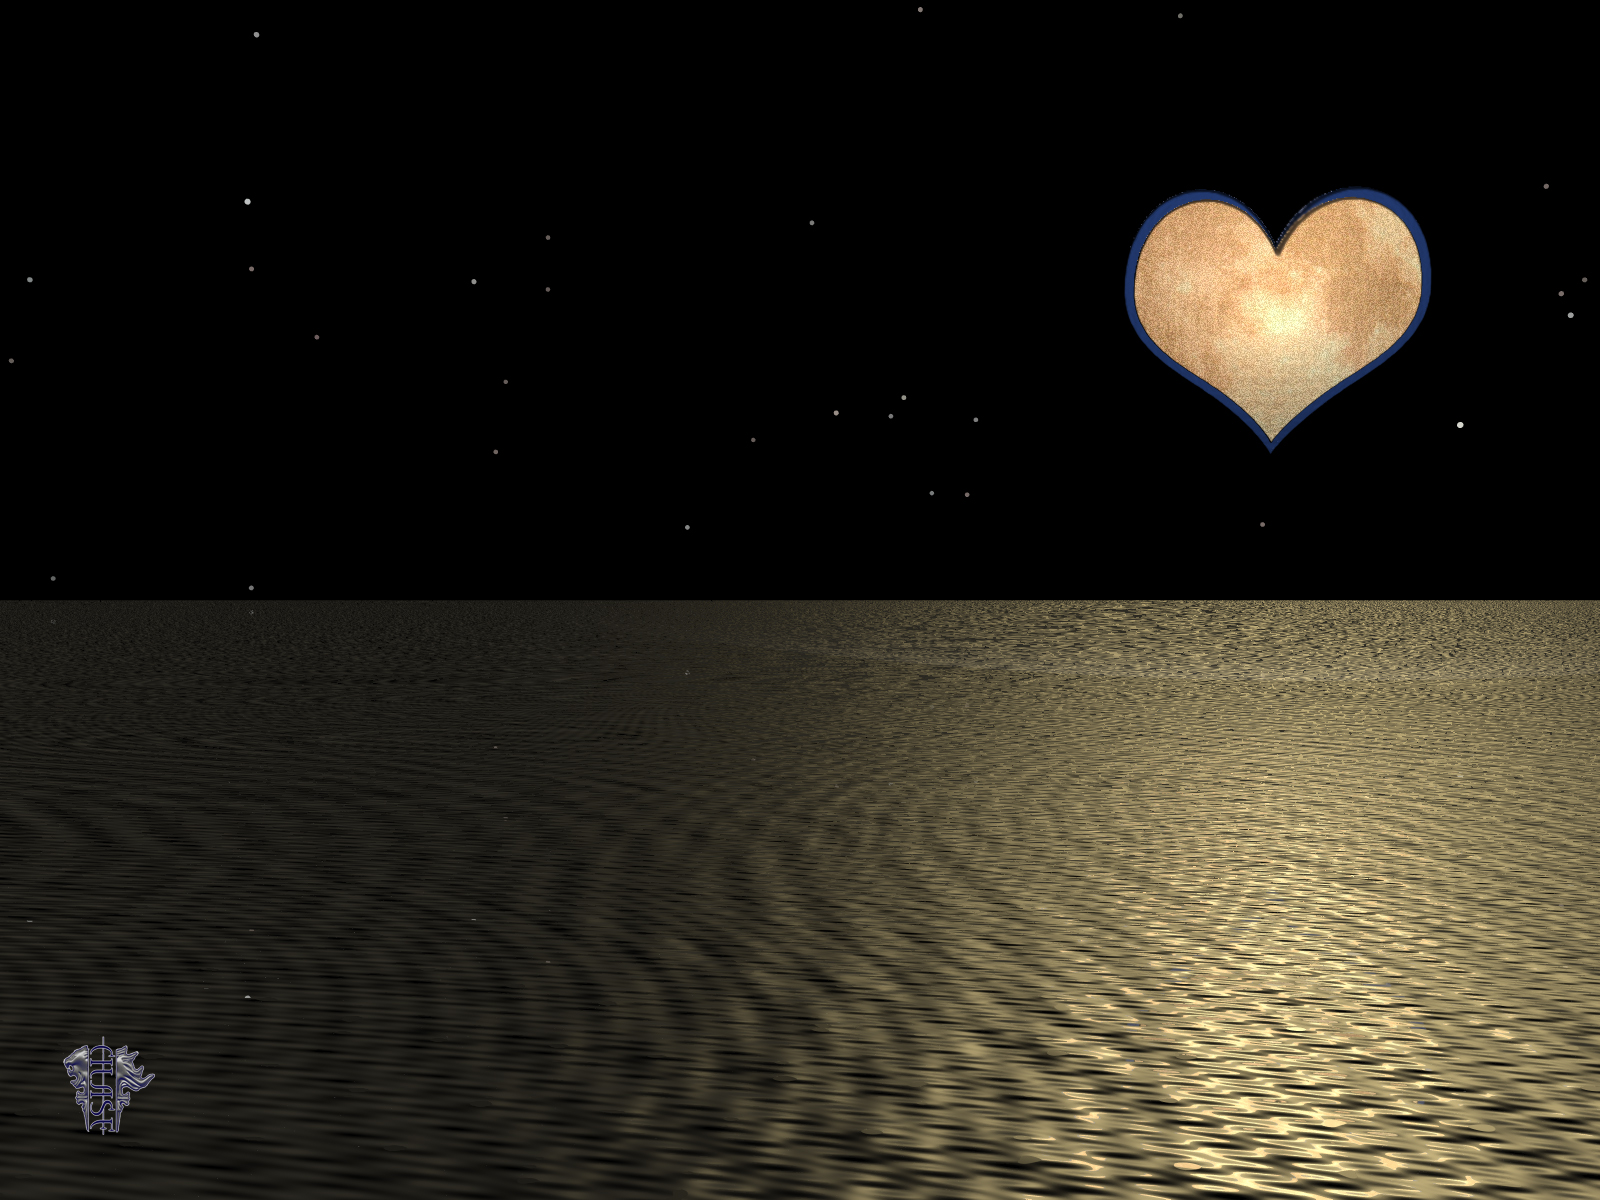 kingdom_hearts_moon_by_chasef